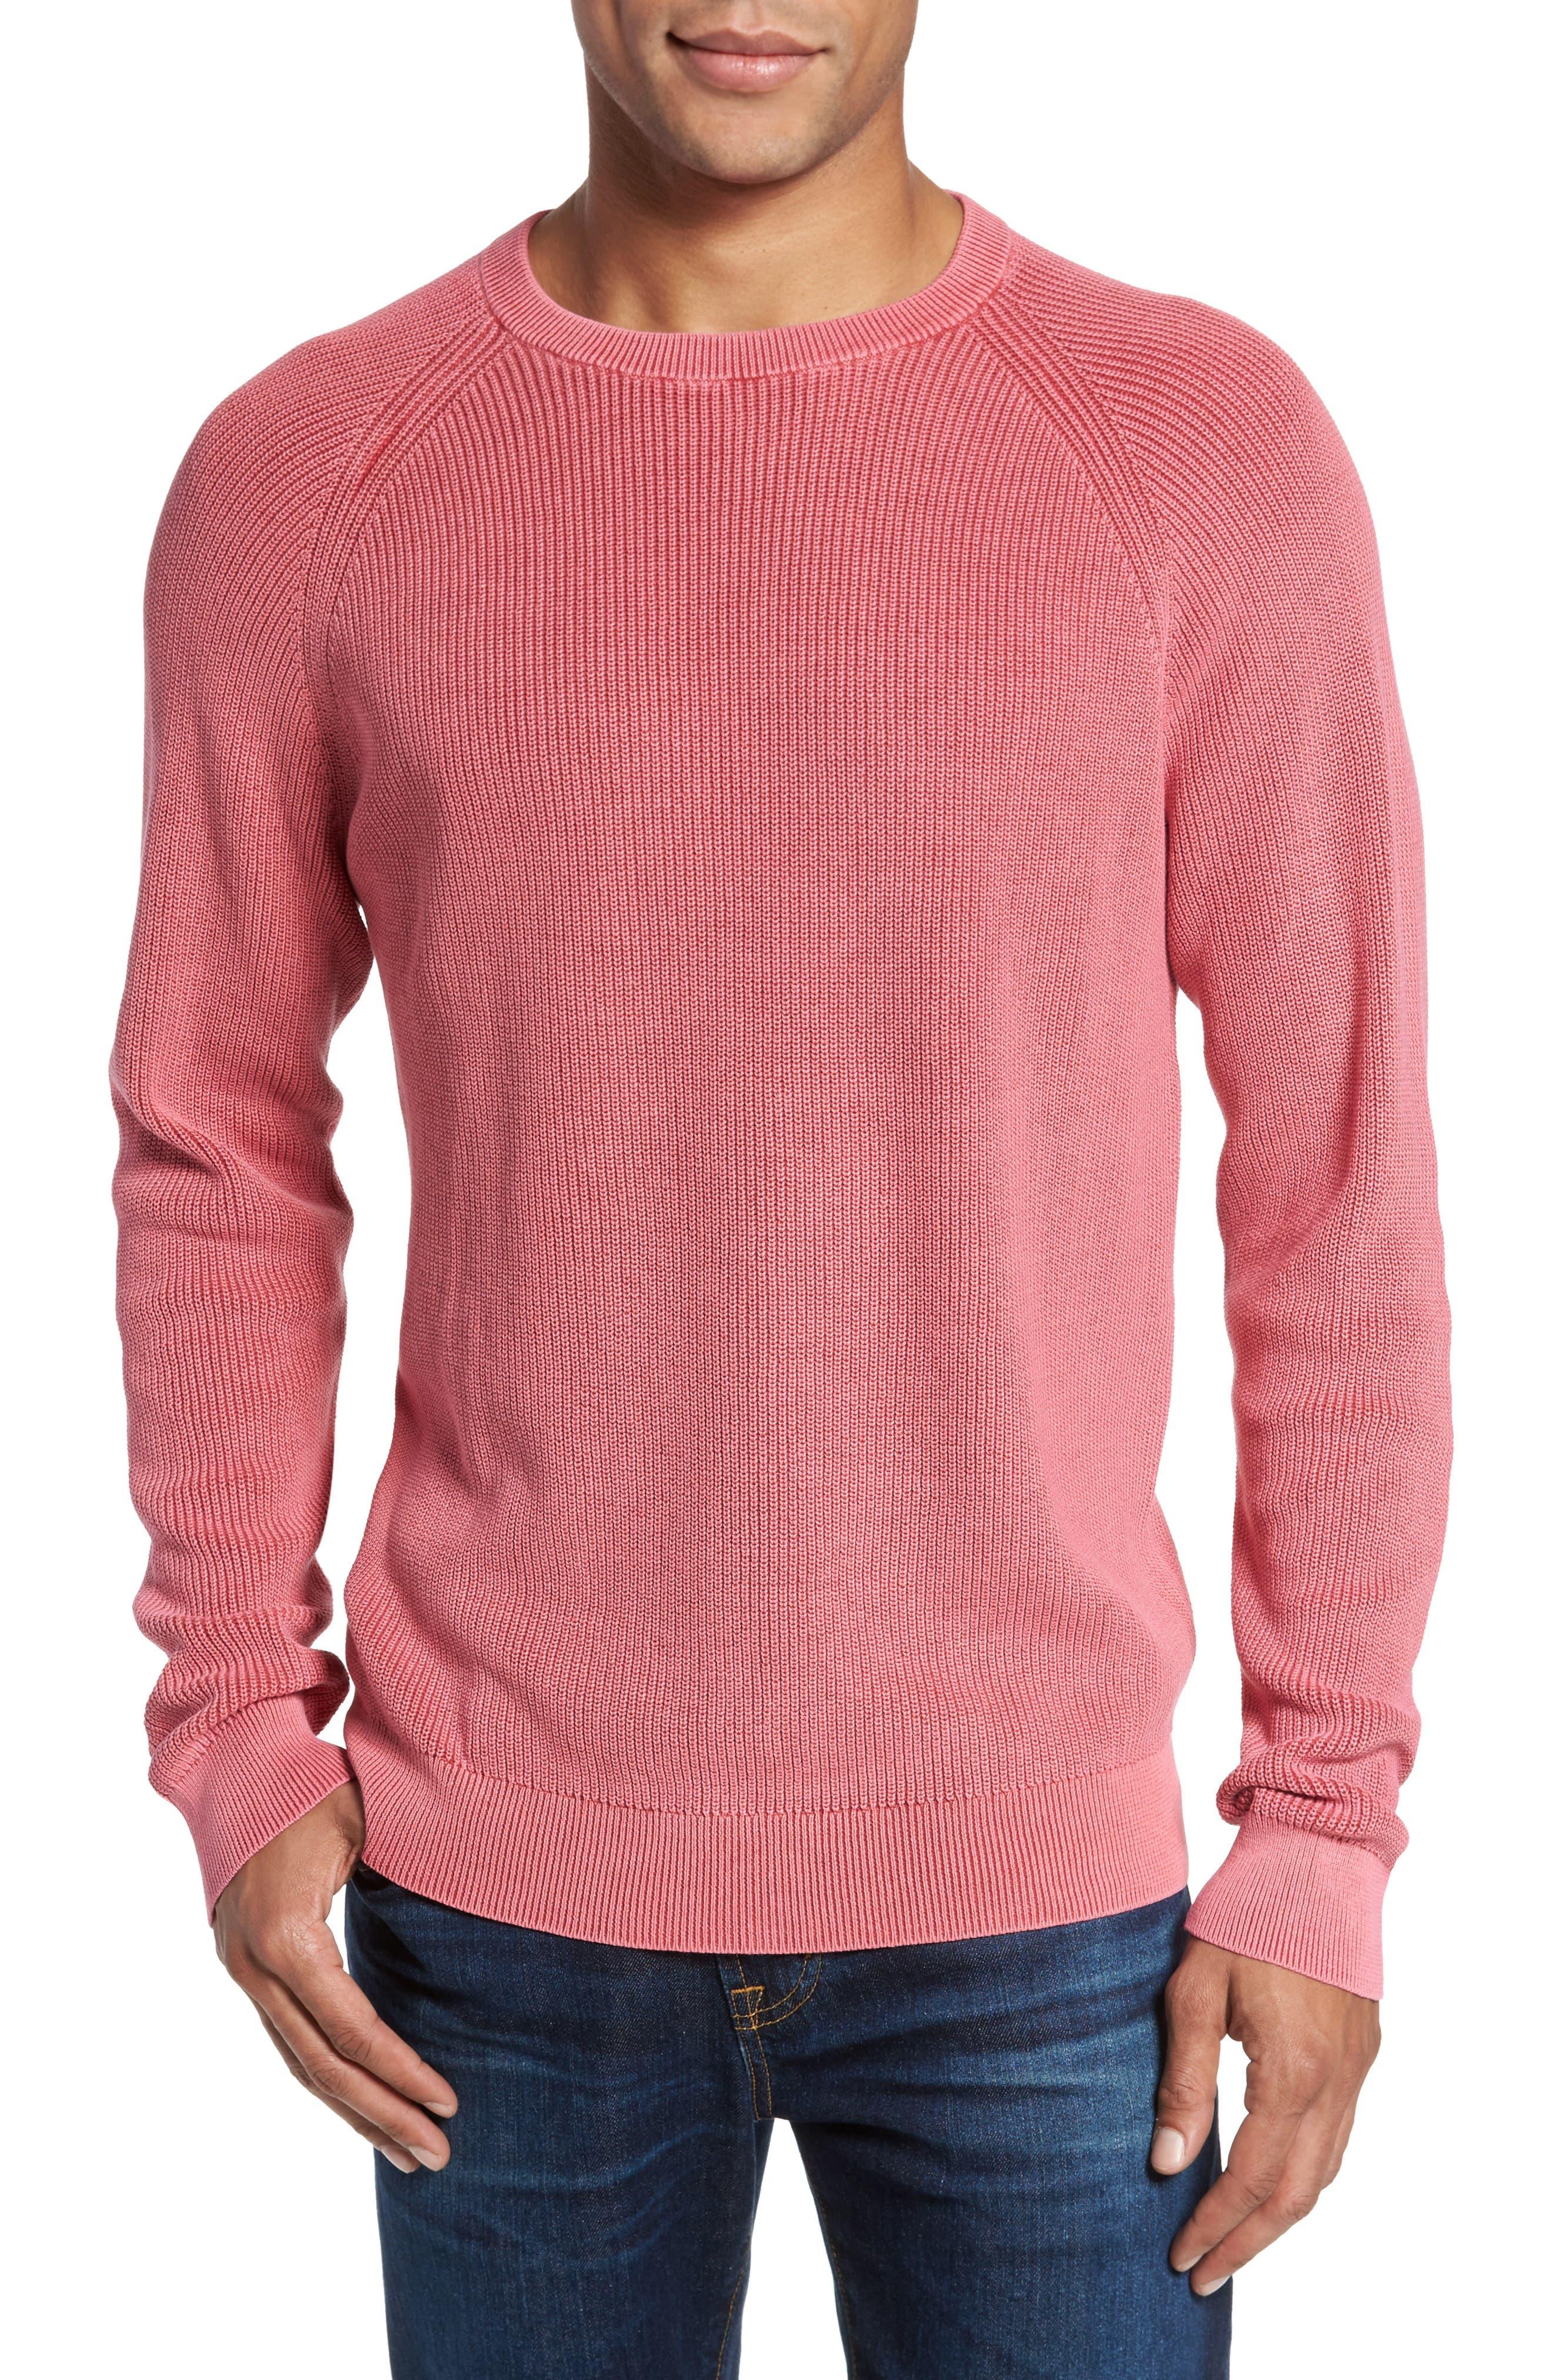 Main Image - Nordstrom Men's Shop Crewneck Sweater (Regular)